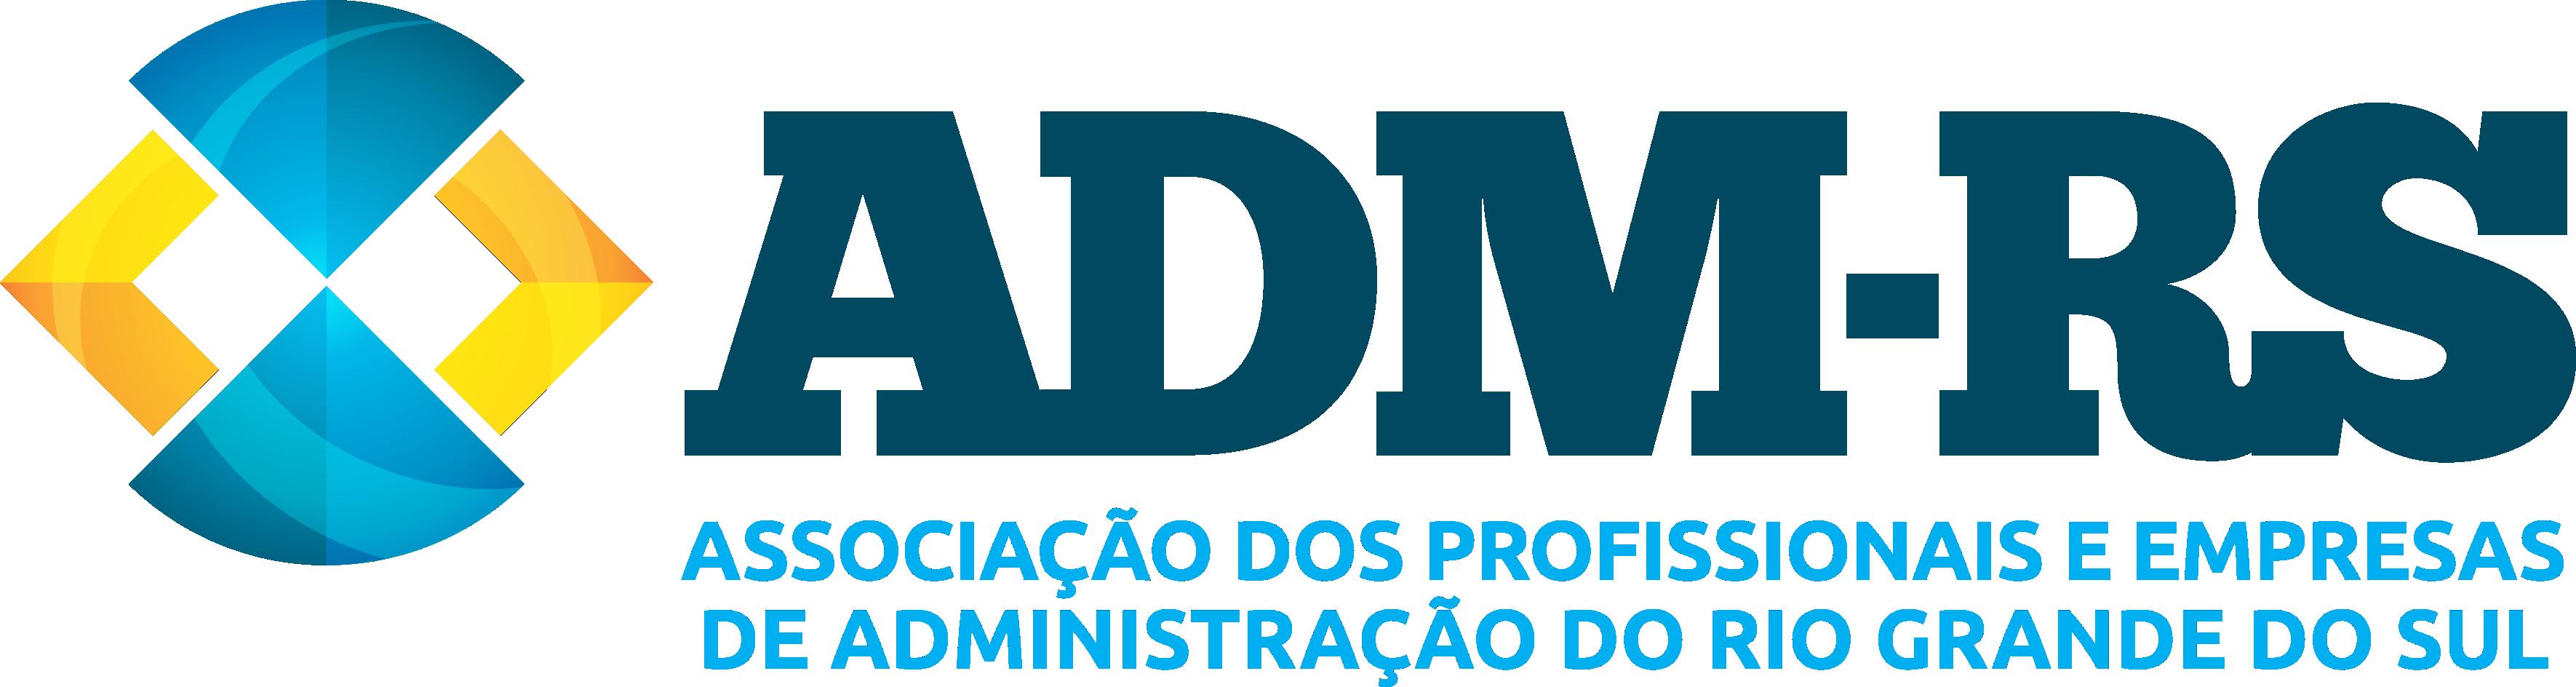 logos_adm_png.png